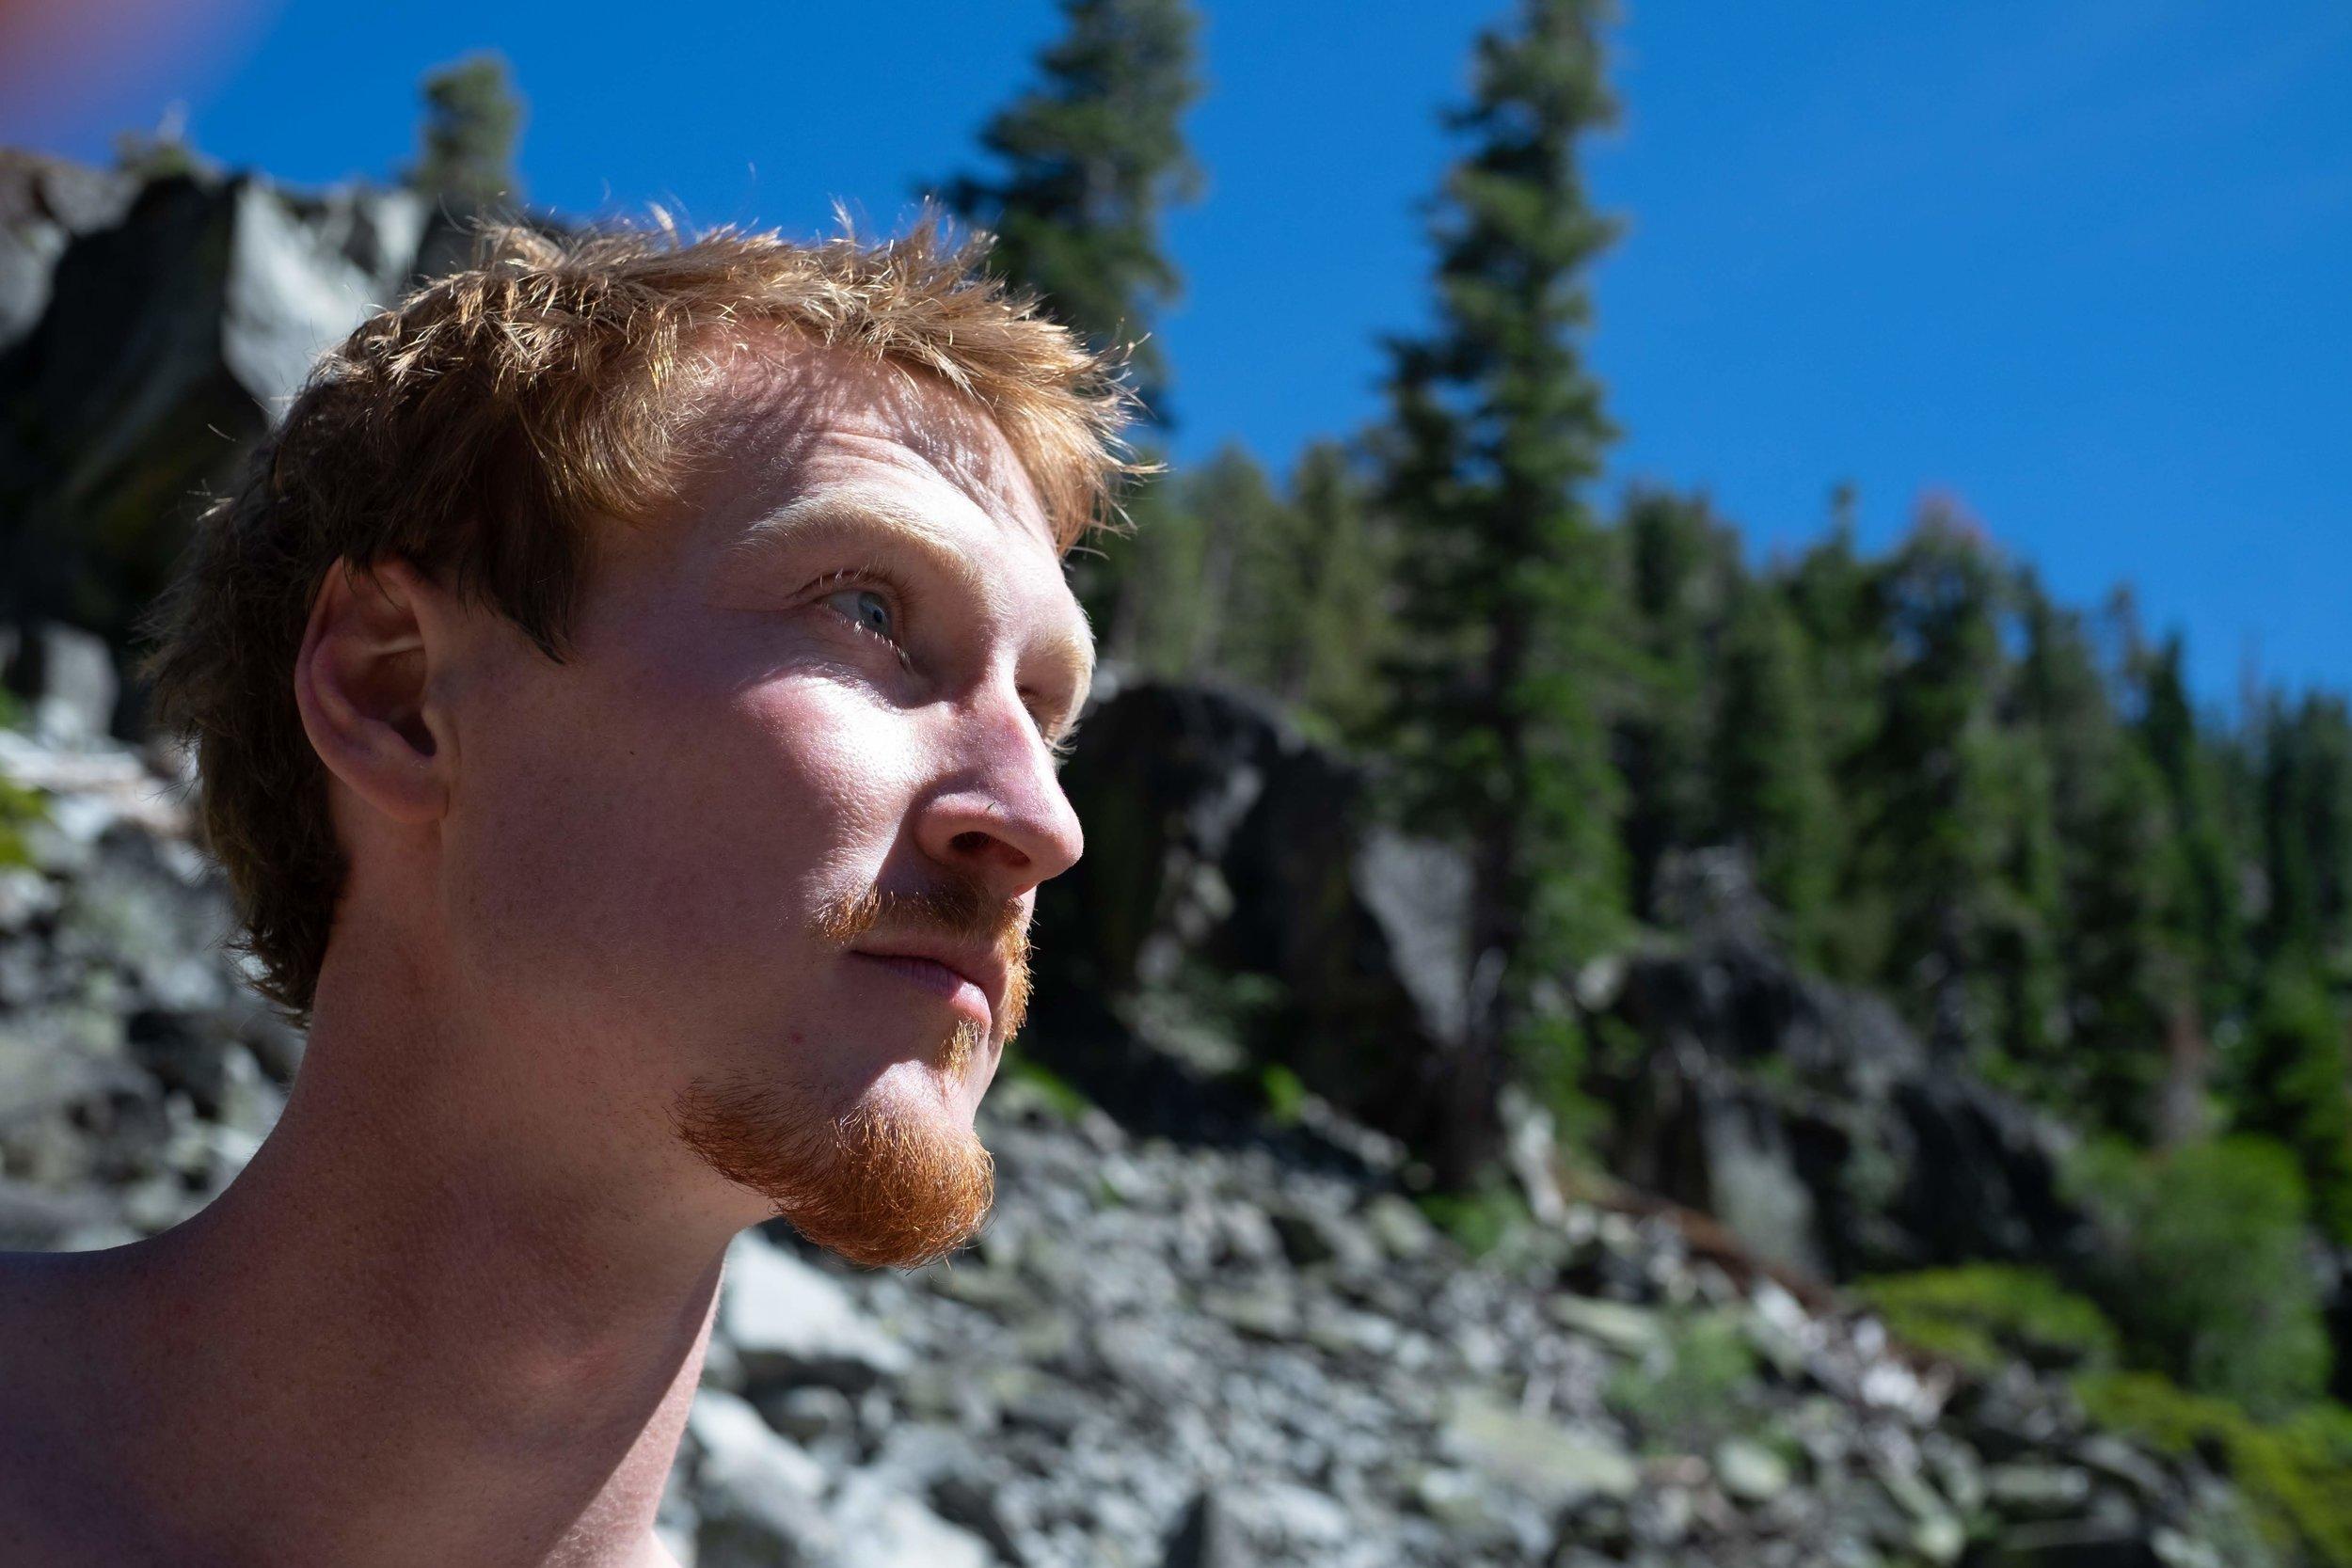 Luen, Dry Farm Wines Wine Director, taking time in Nature near Lake Tahoe, CA